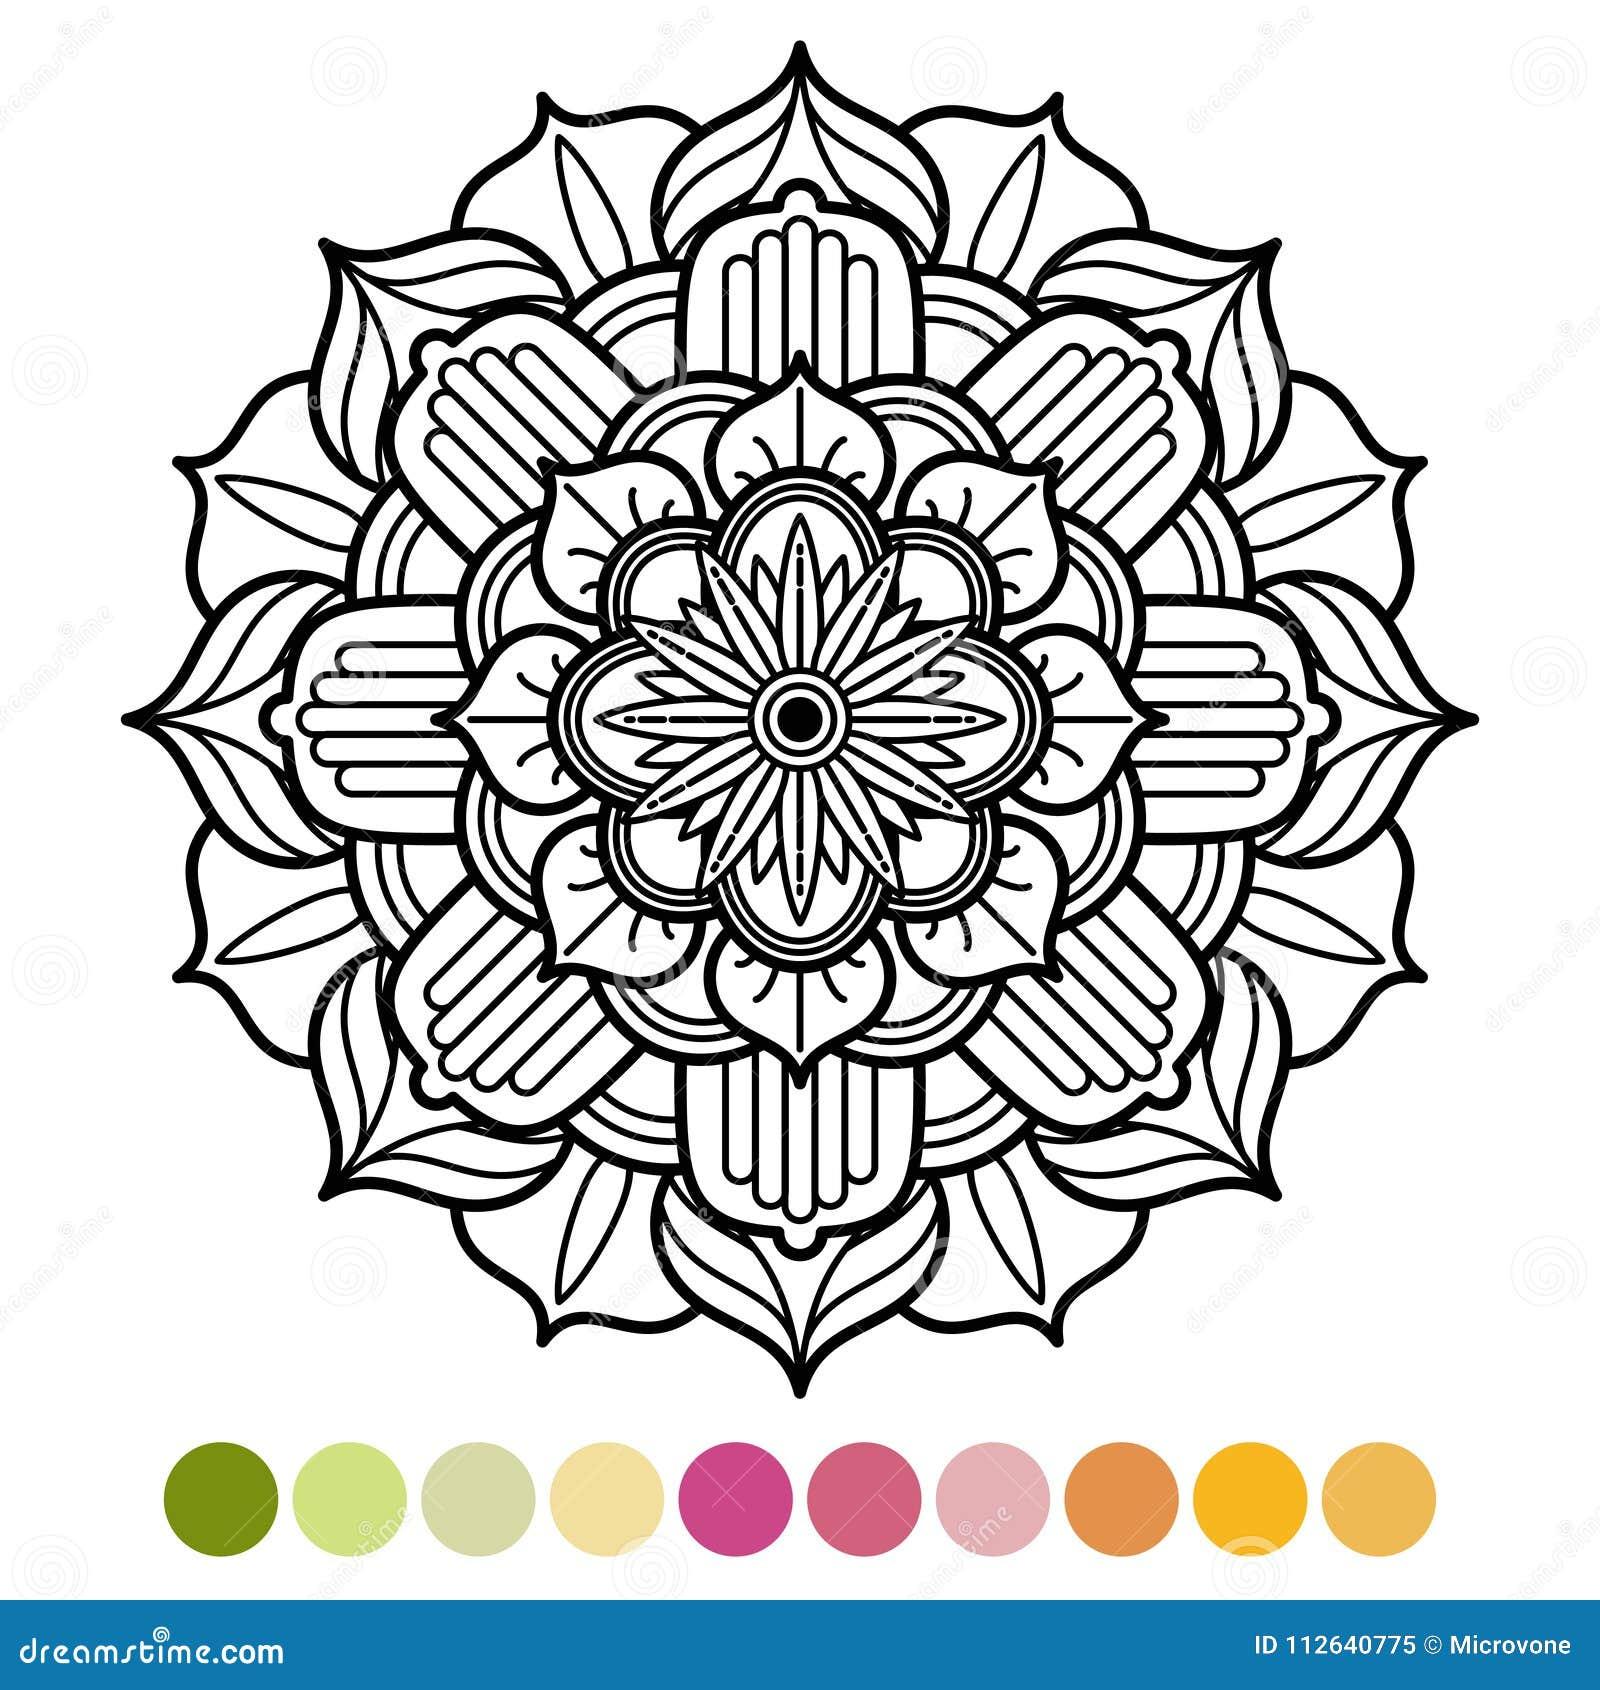 Antistress Mandala Coloring Page With Colors Sample